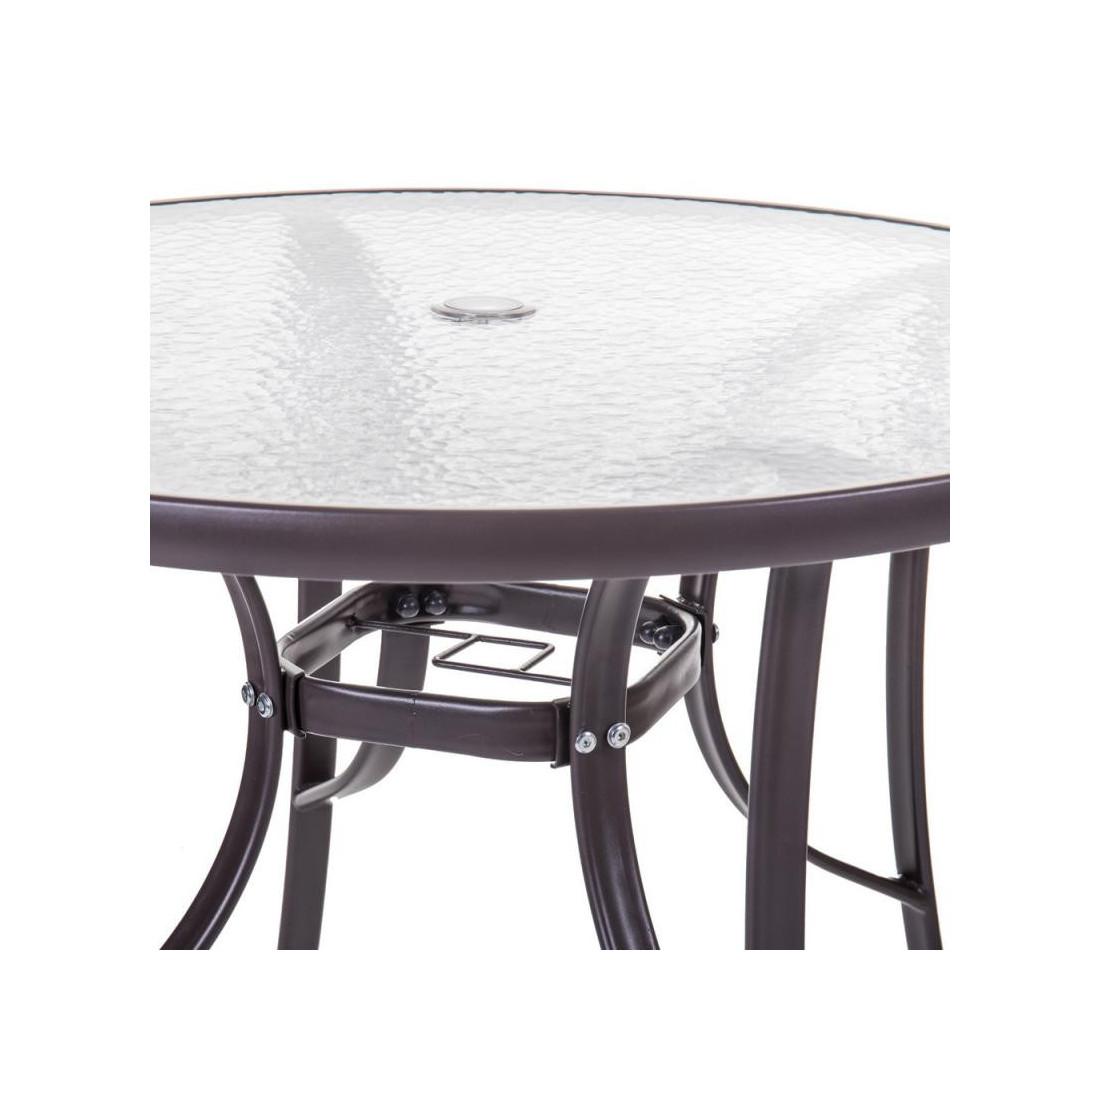 Table de repas ronde Verre/Acier marron TIKEHAU - Univers du Jardin